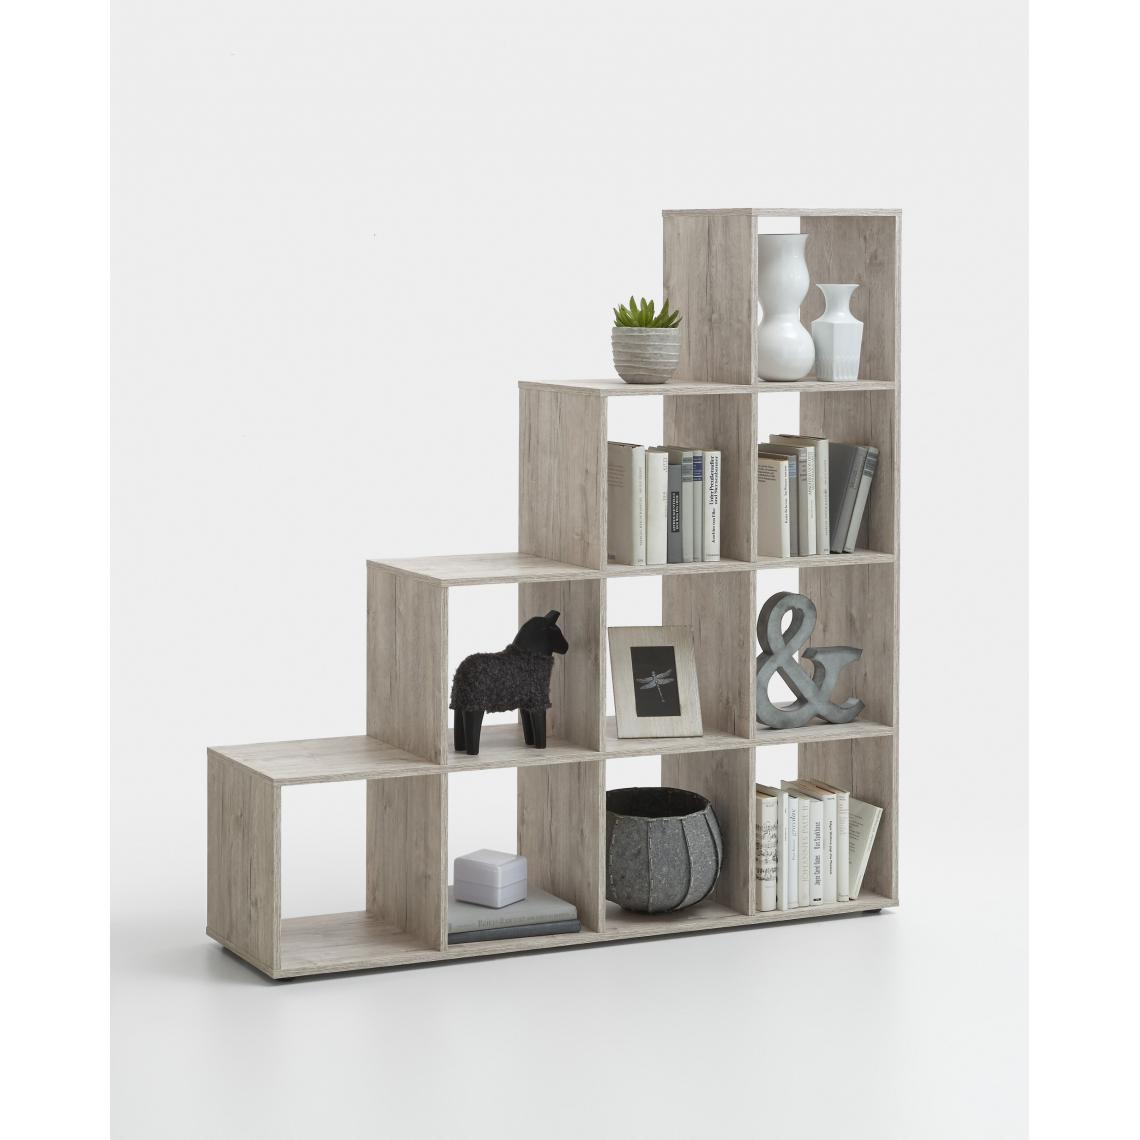 3S. x Home Bibliothèque escalier 10 cases LOUDA